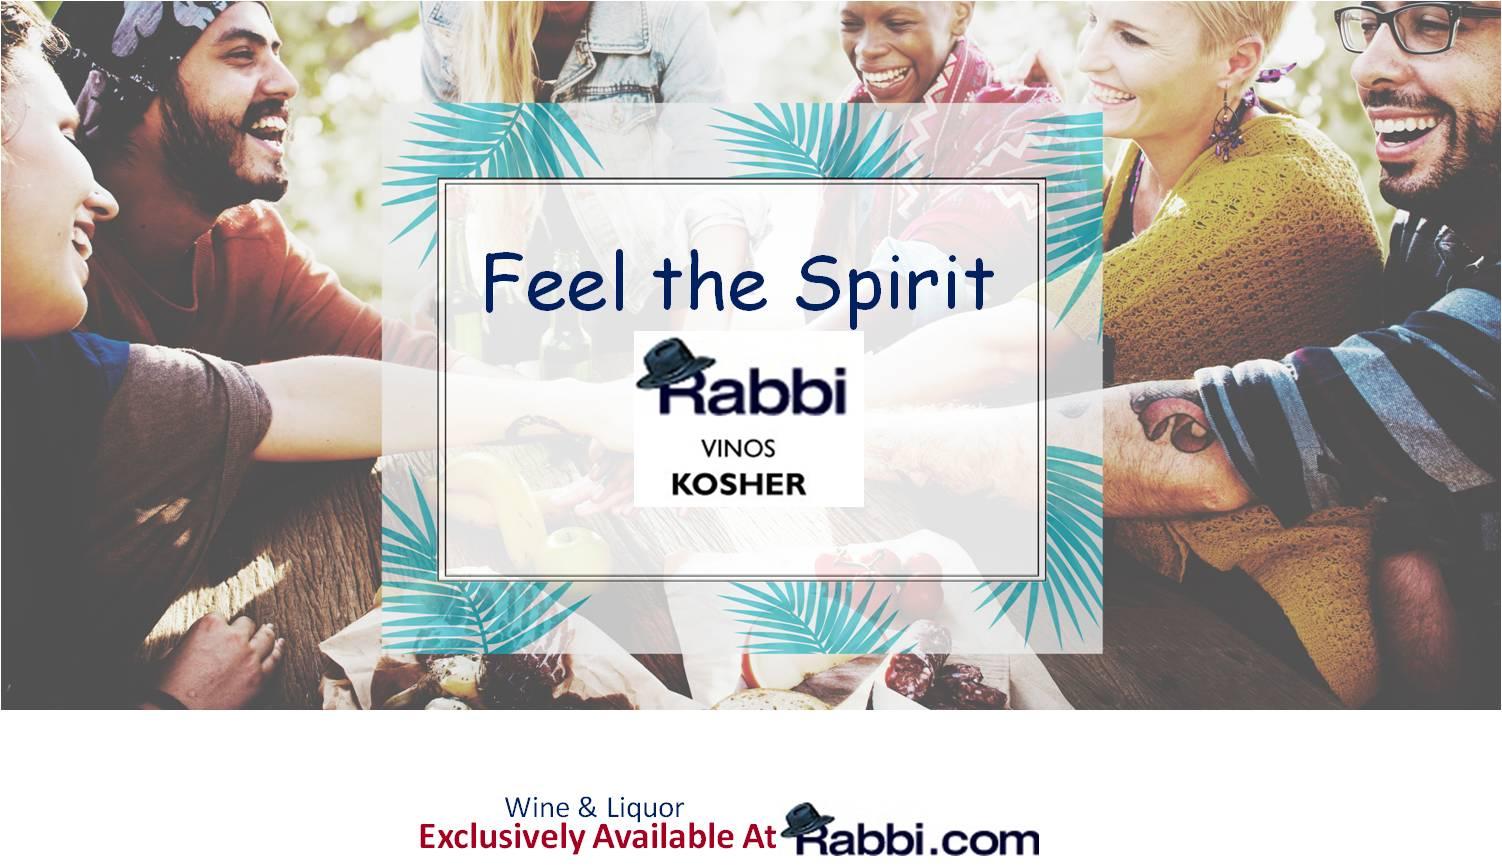 Rabbi Kosher Wines